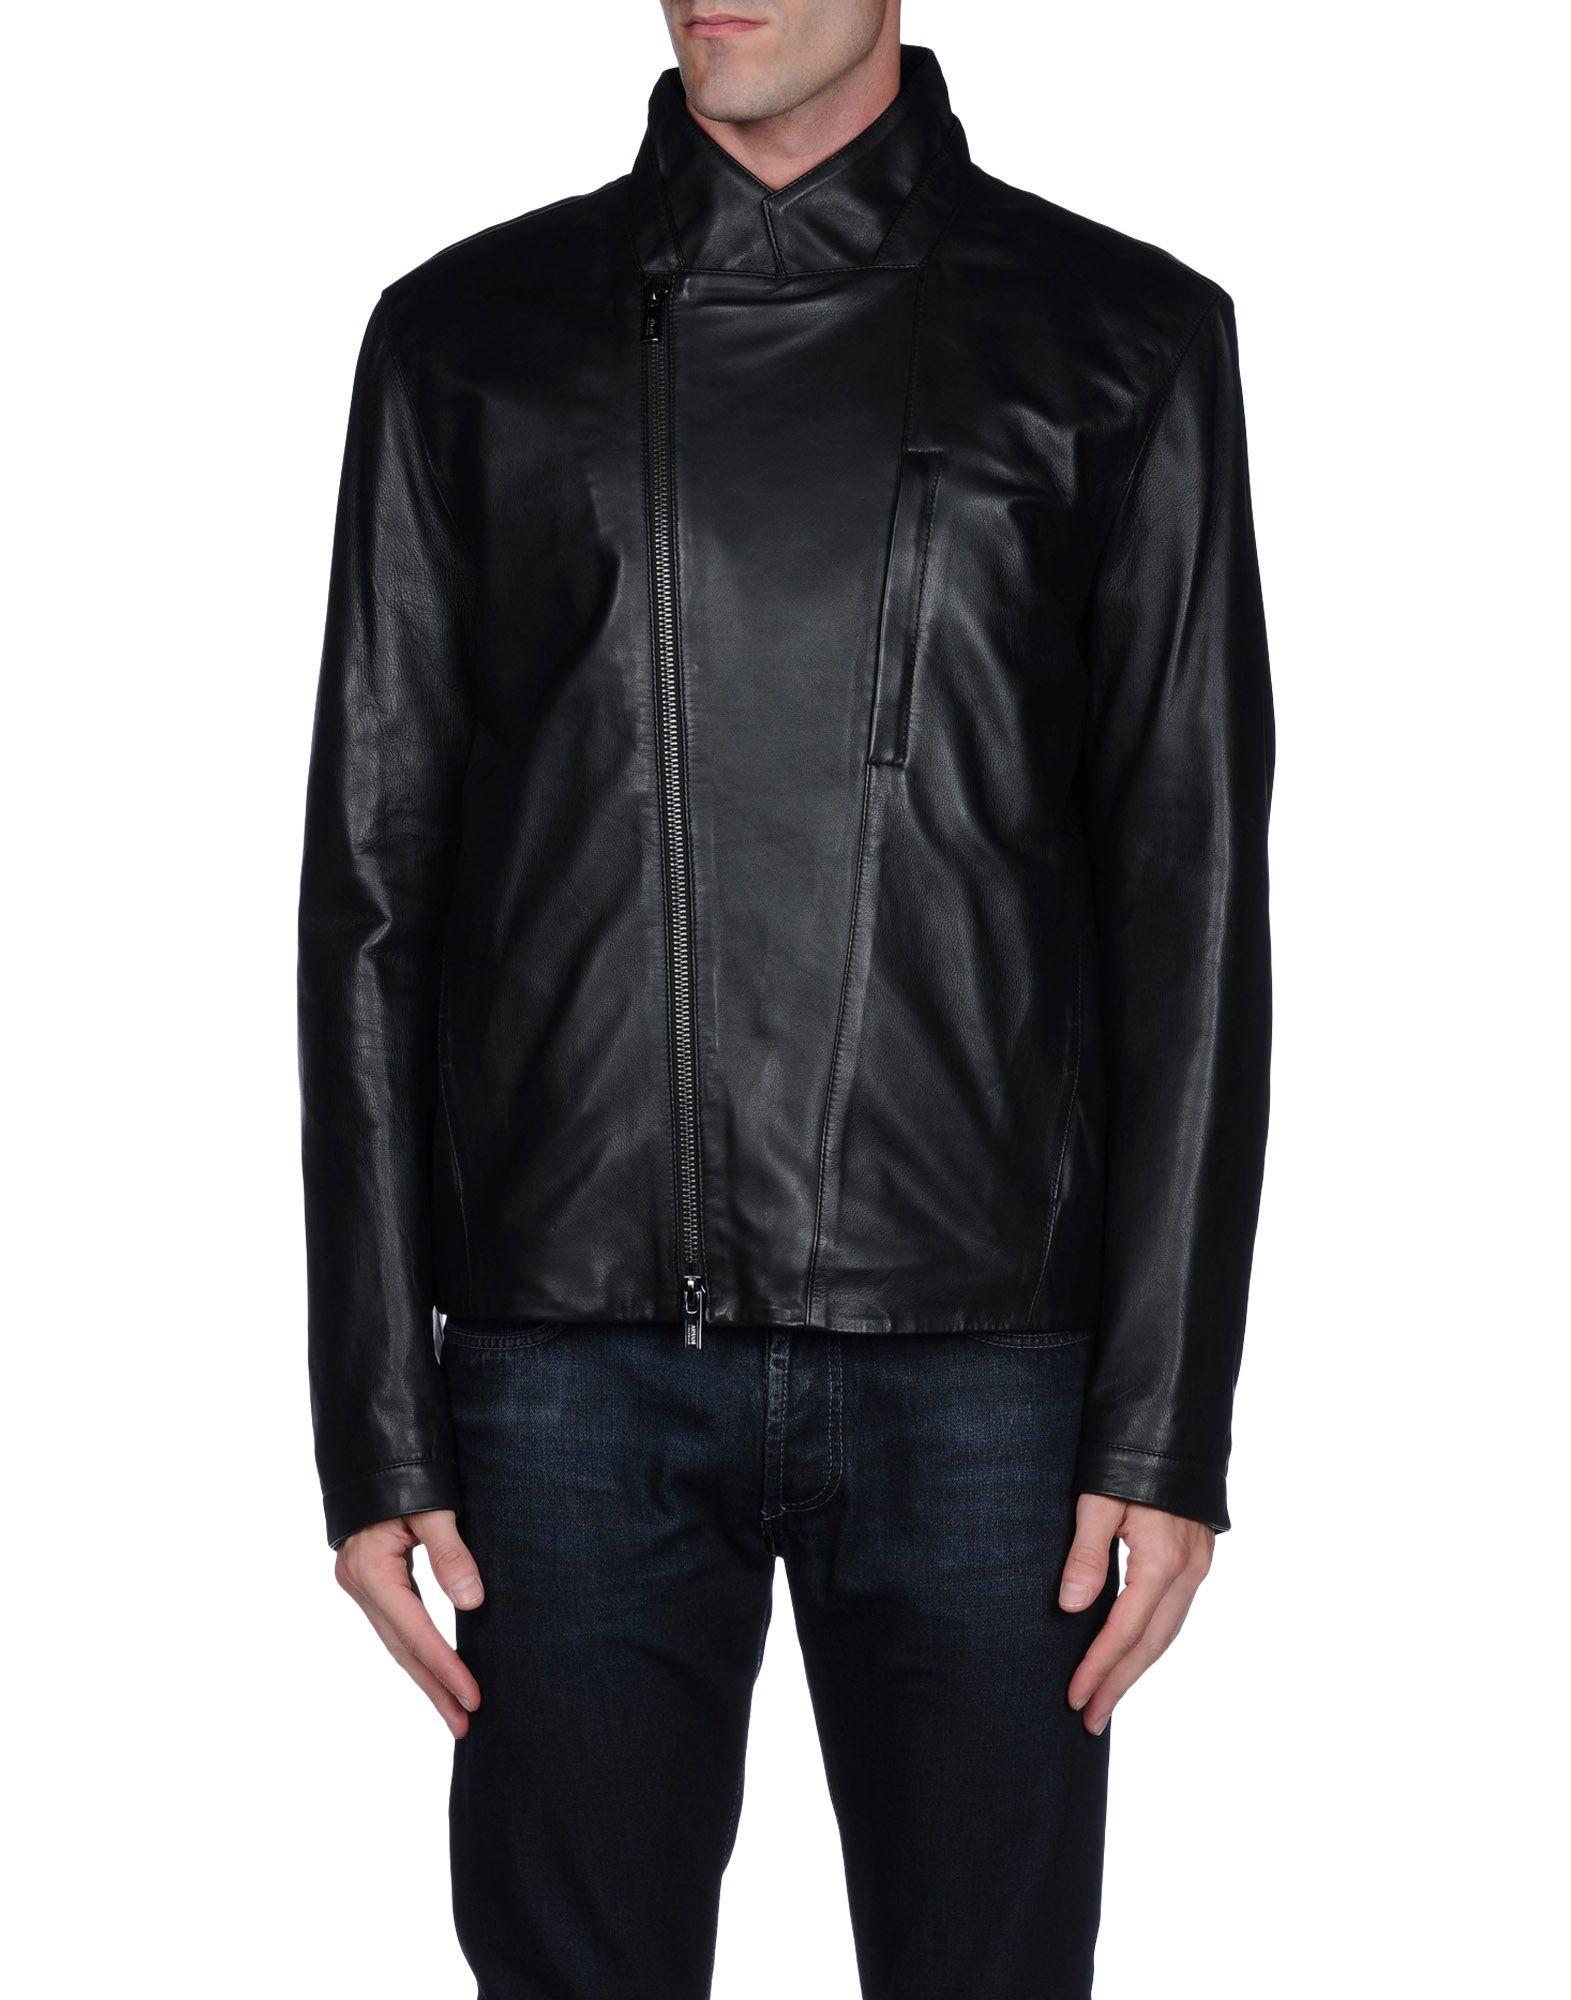 Armani Jacket in Black for Men | Lyst Giorgio Armani Jacket